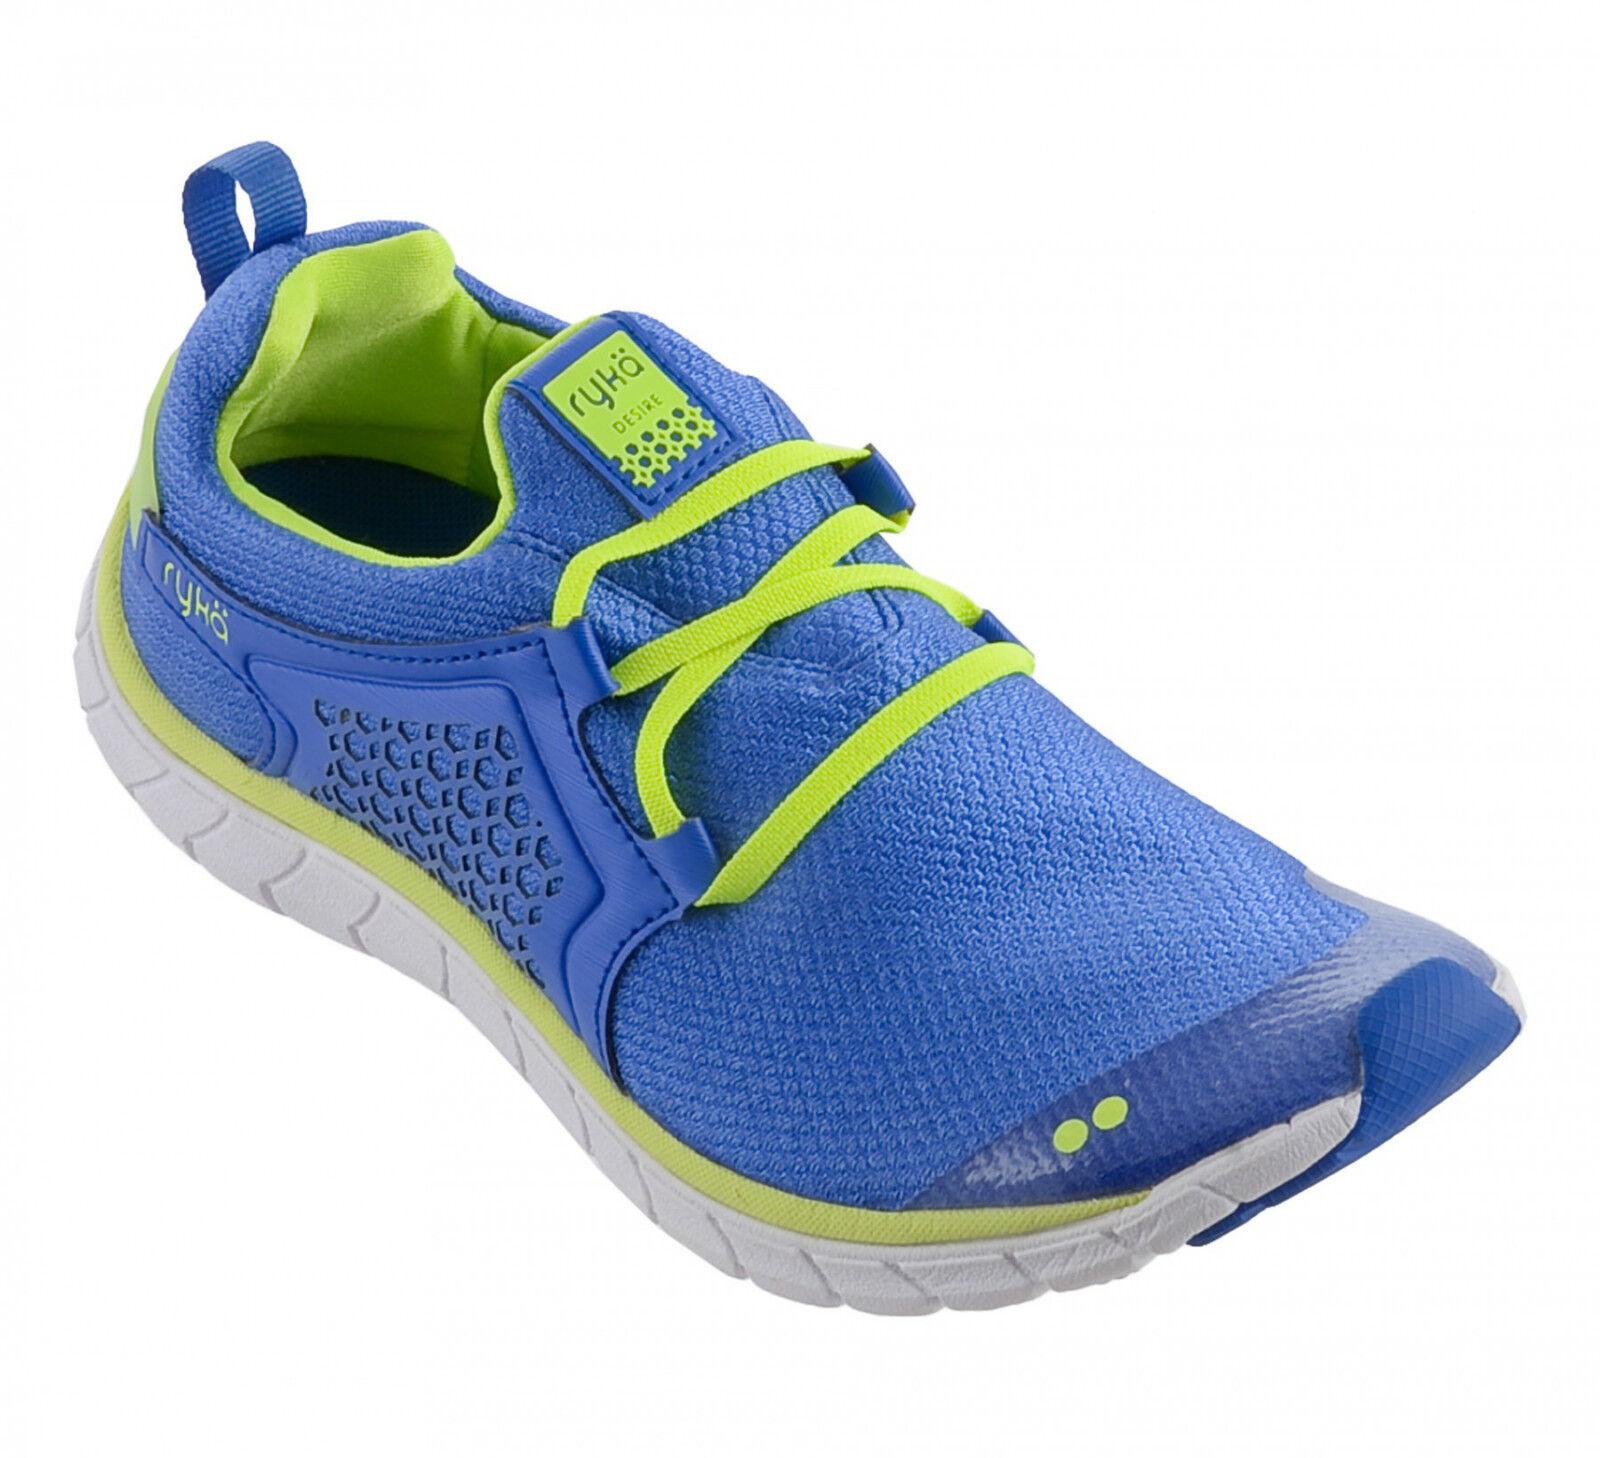 RYKÄ DESIRE Trainingsschuhe Fitness Schuhe Sportschuhe Sneakers, Gr. 37.5, Neu